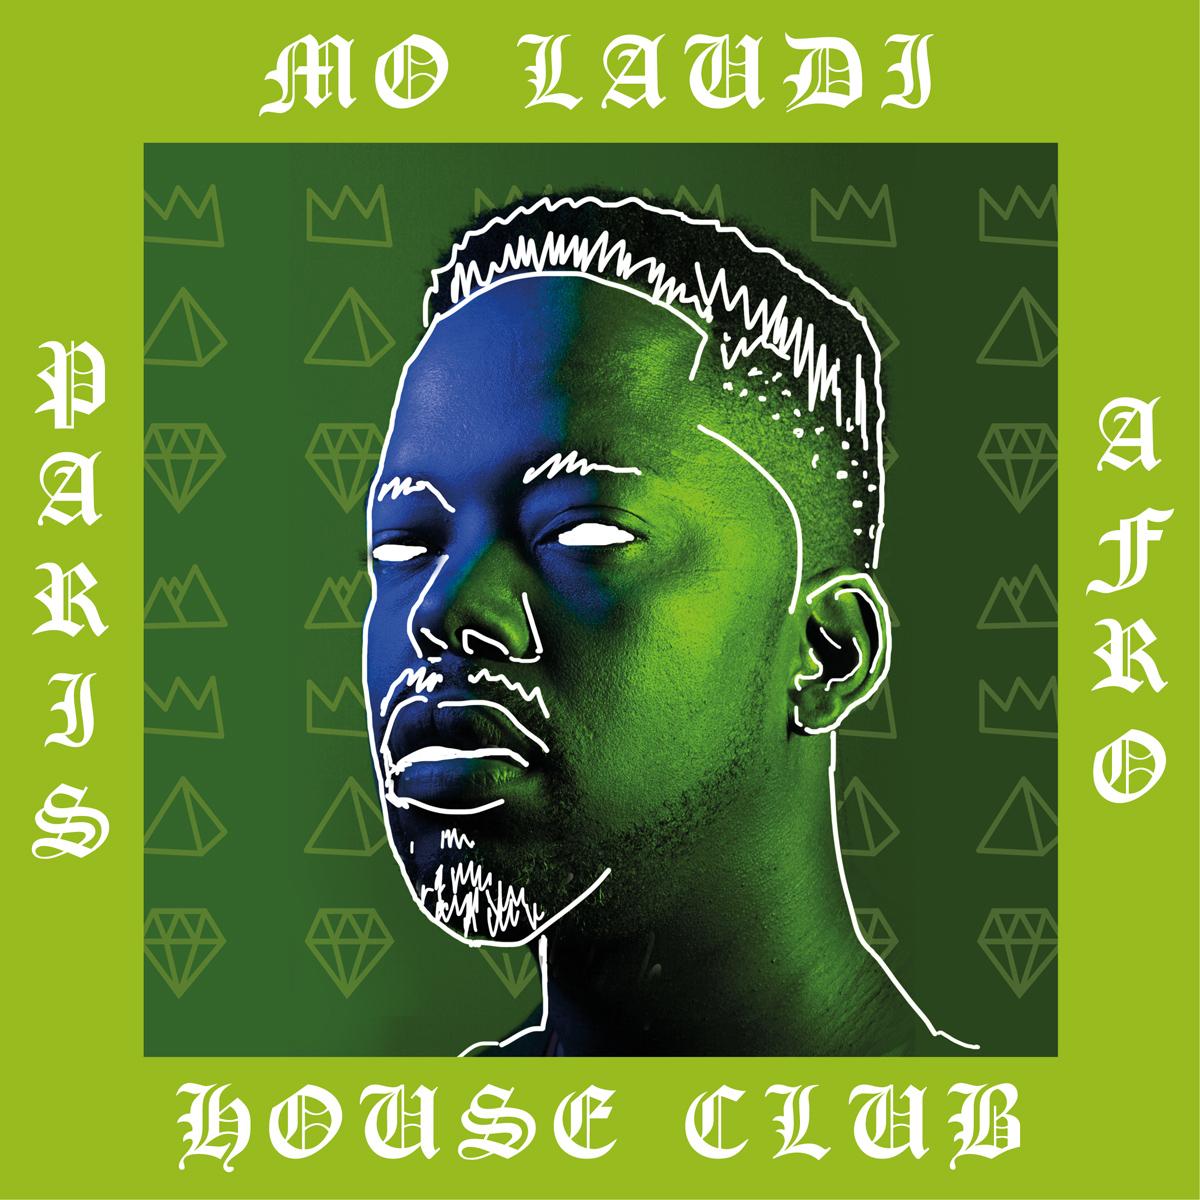 molaudi-paris-afro-house-club-cover-hi